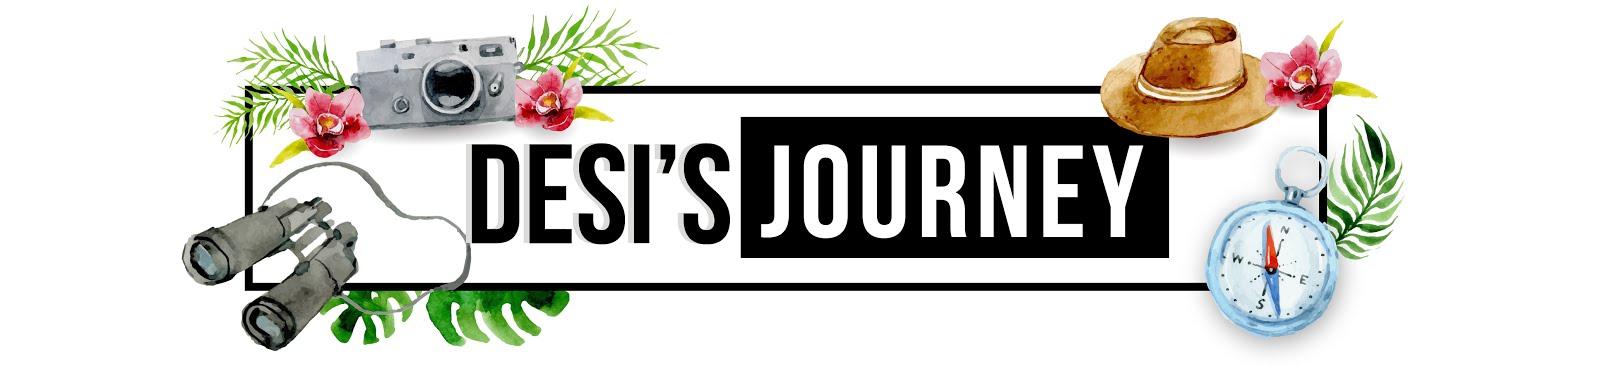 Desi's Journey